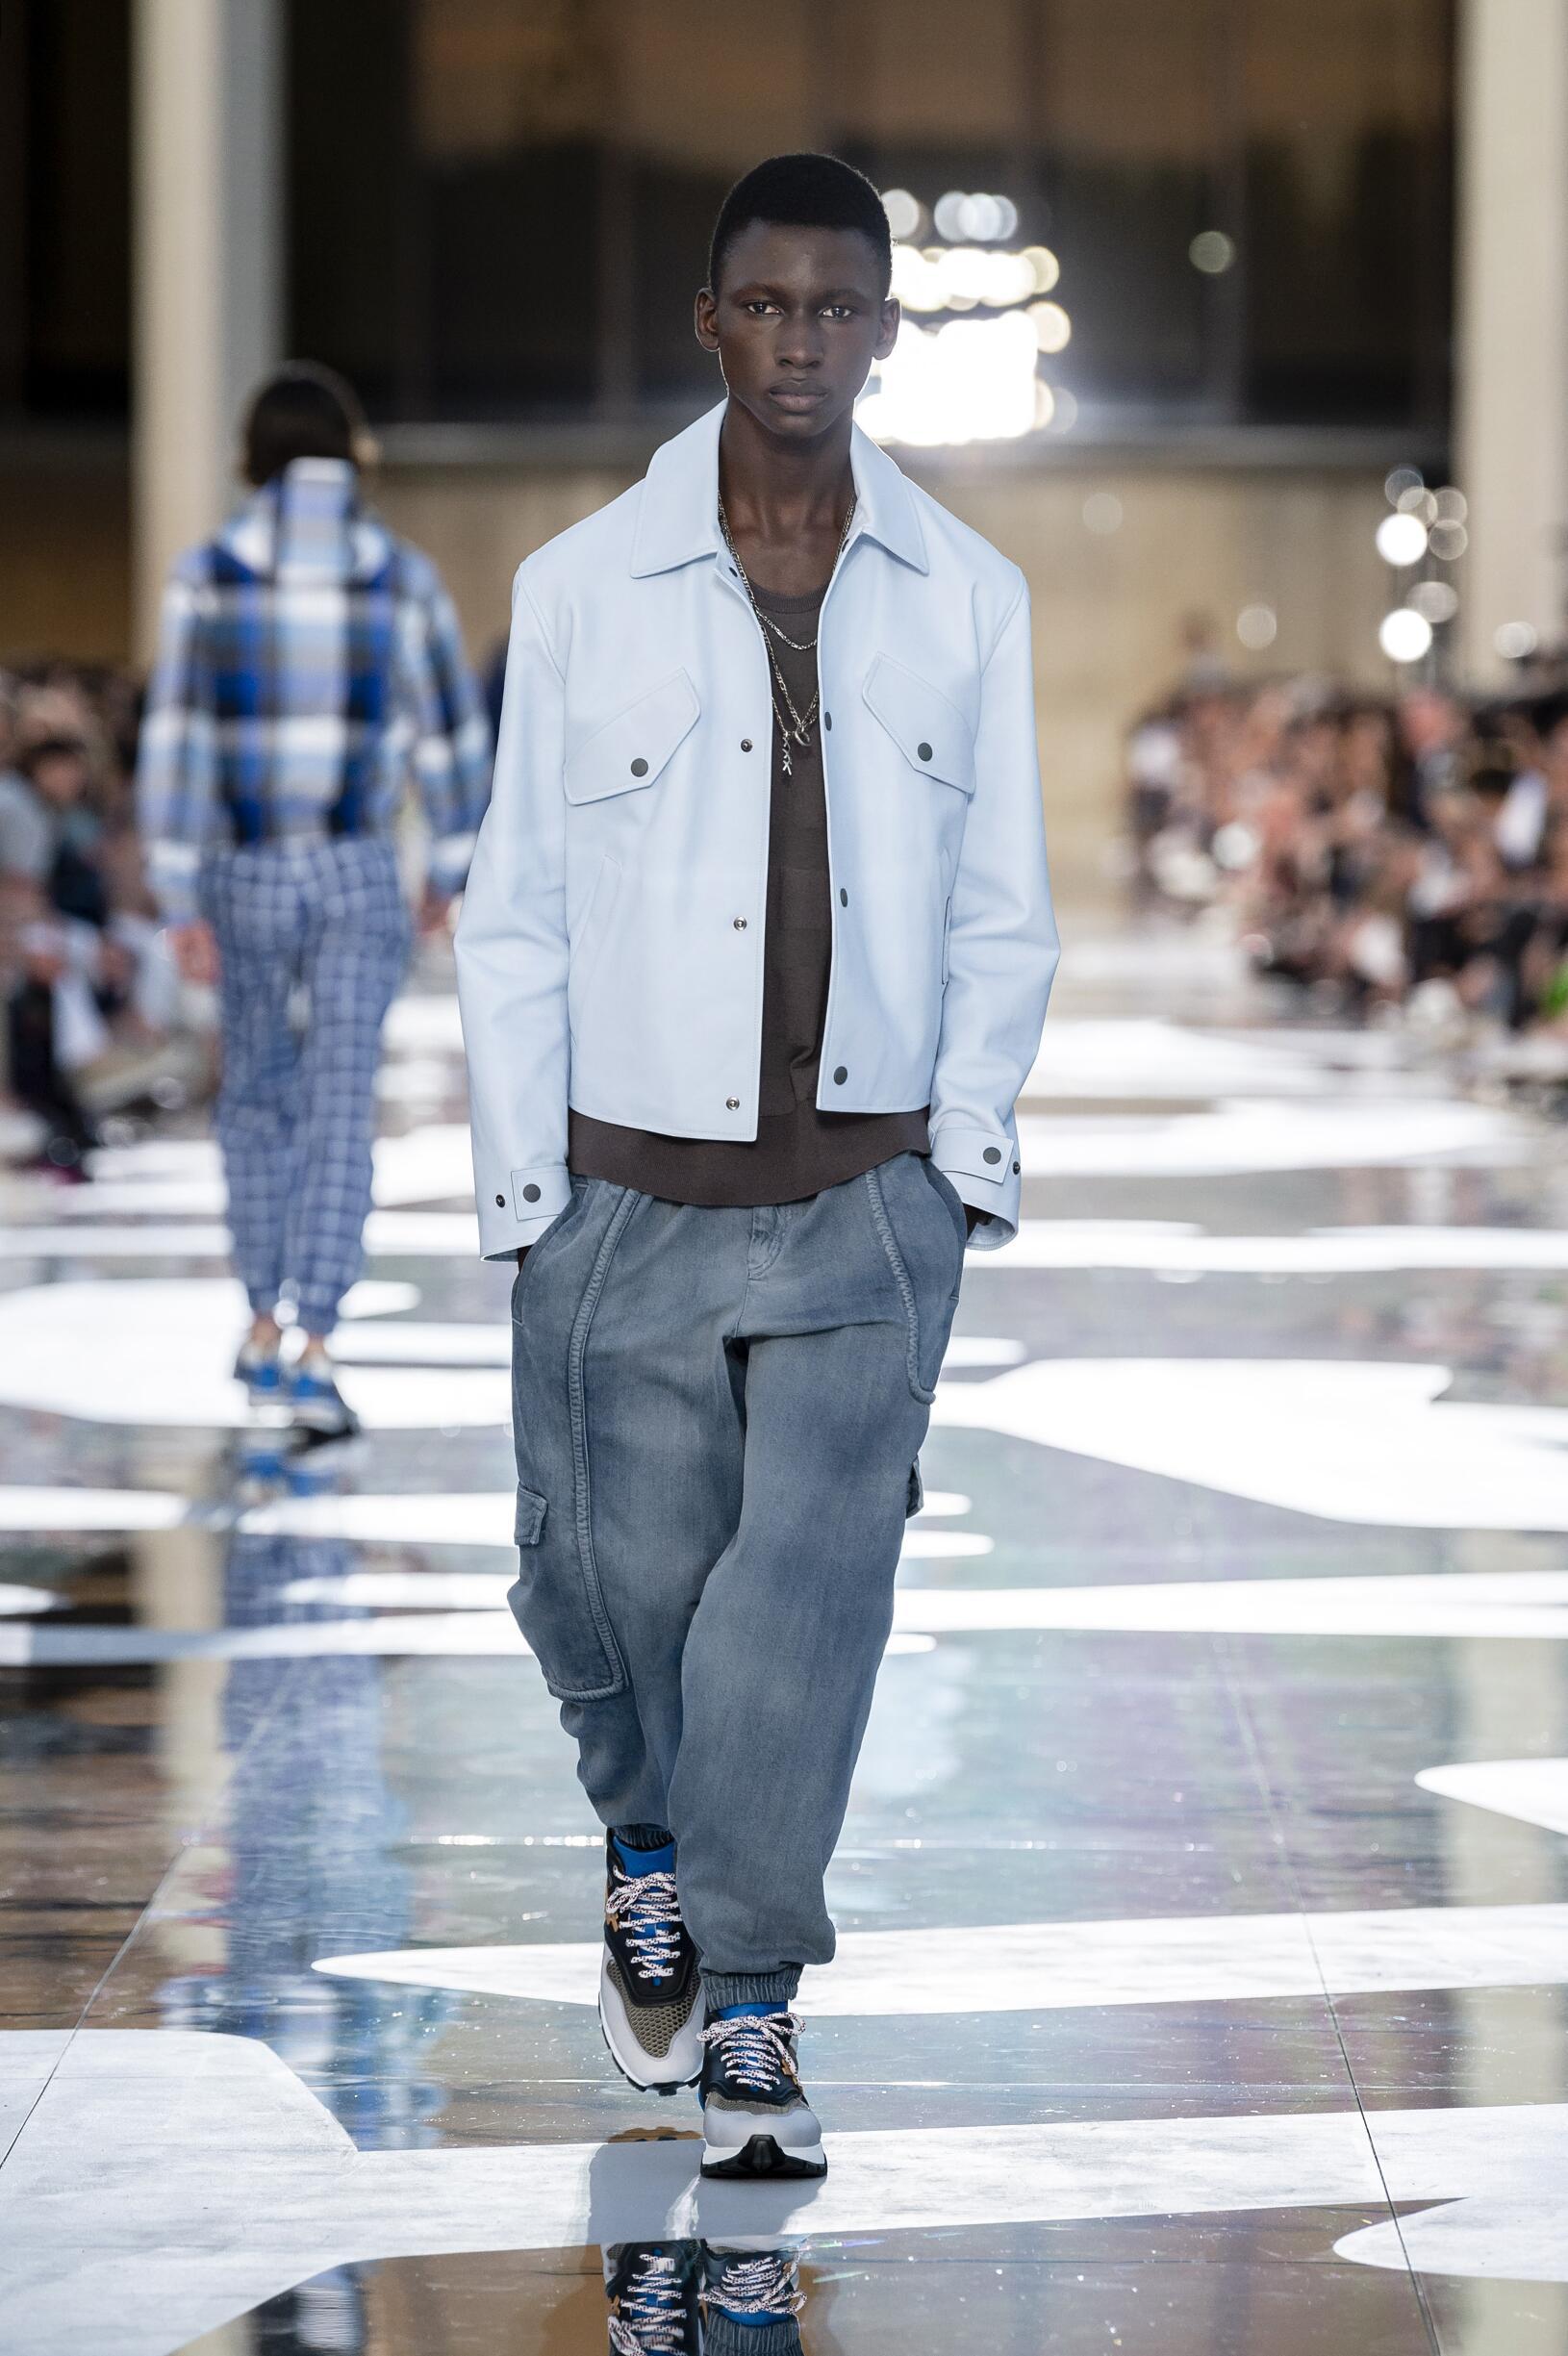 Catwalk Ermenegildo Zegna Couture Man Fashion Show Summer 2019